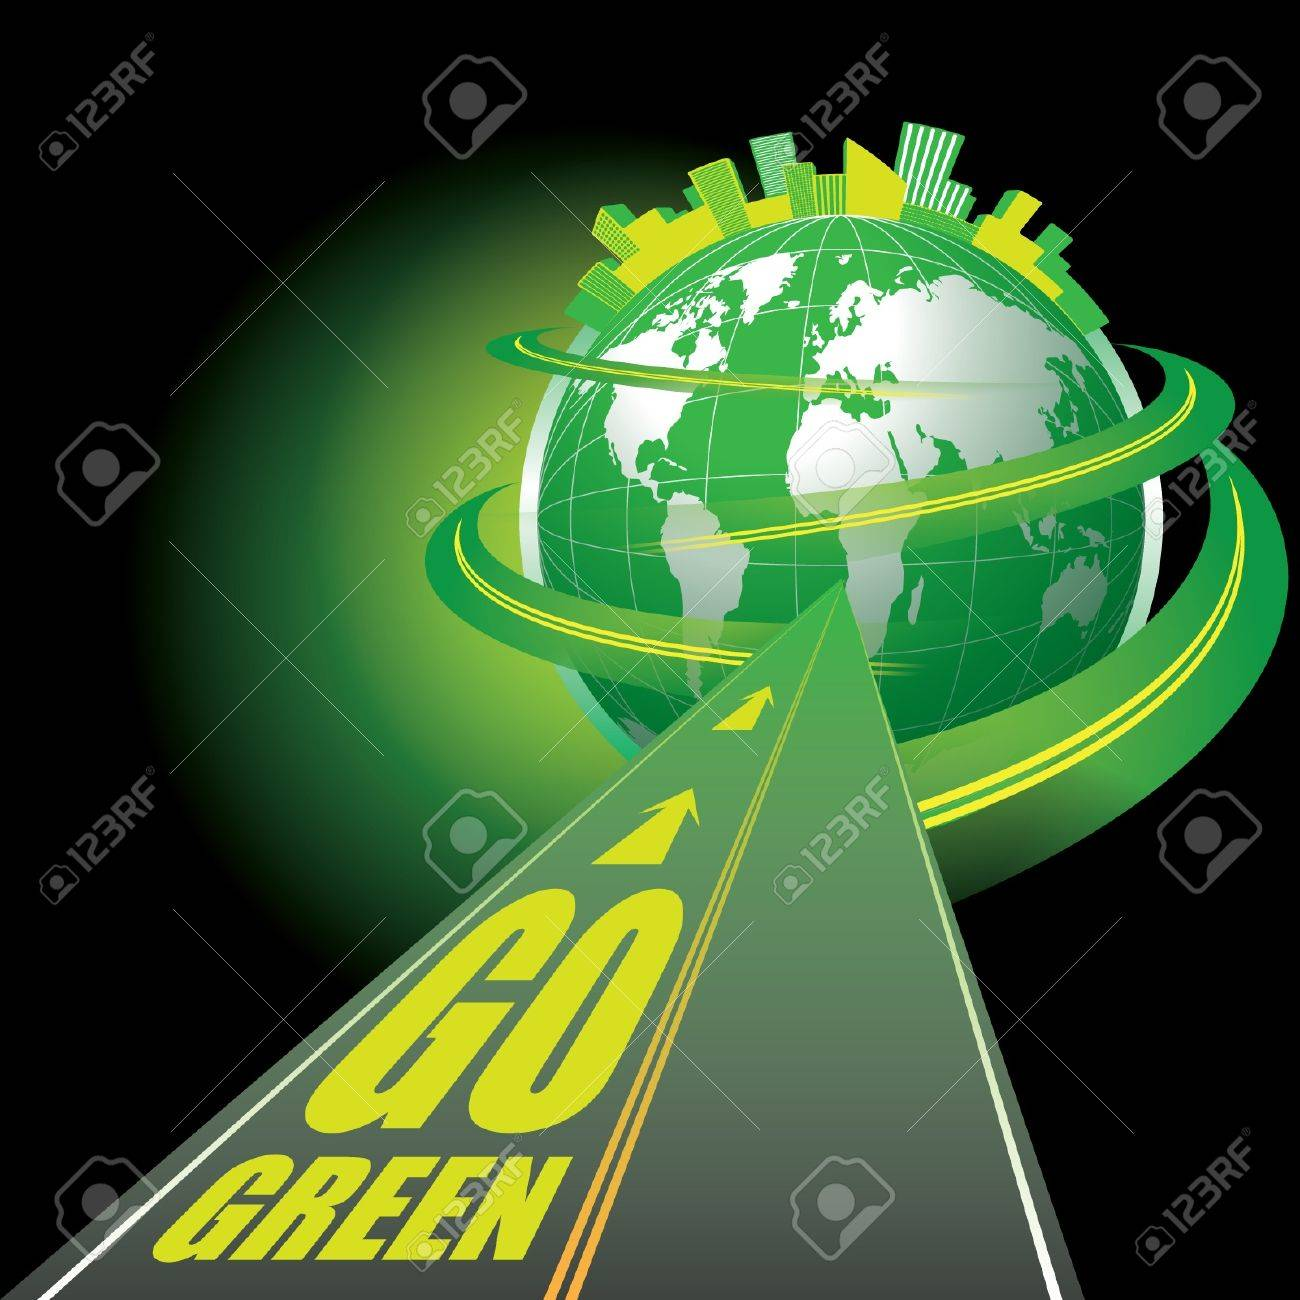 Go Green - 12789378